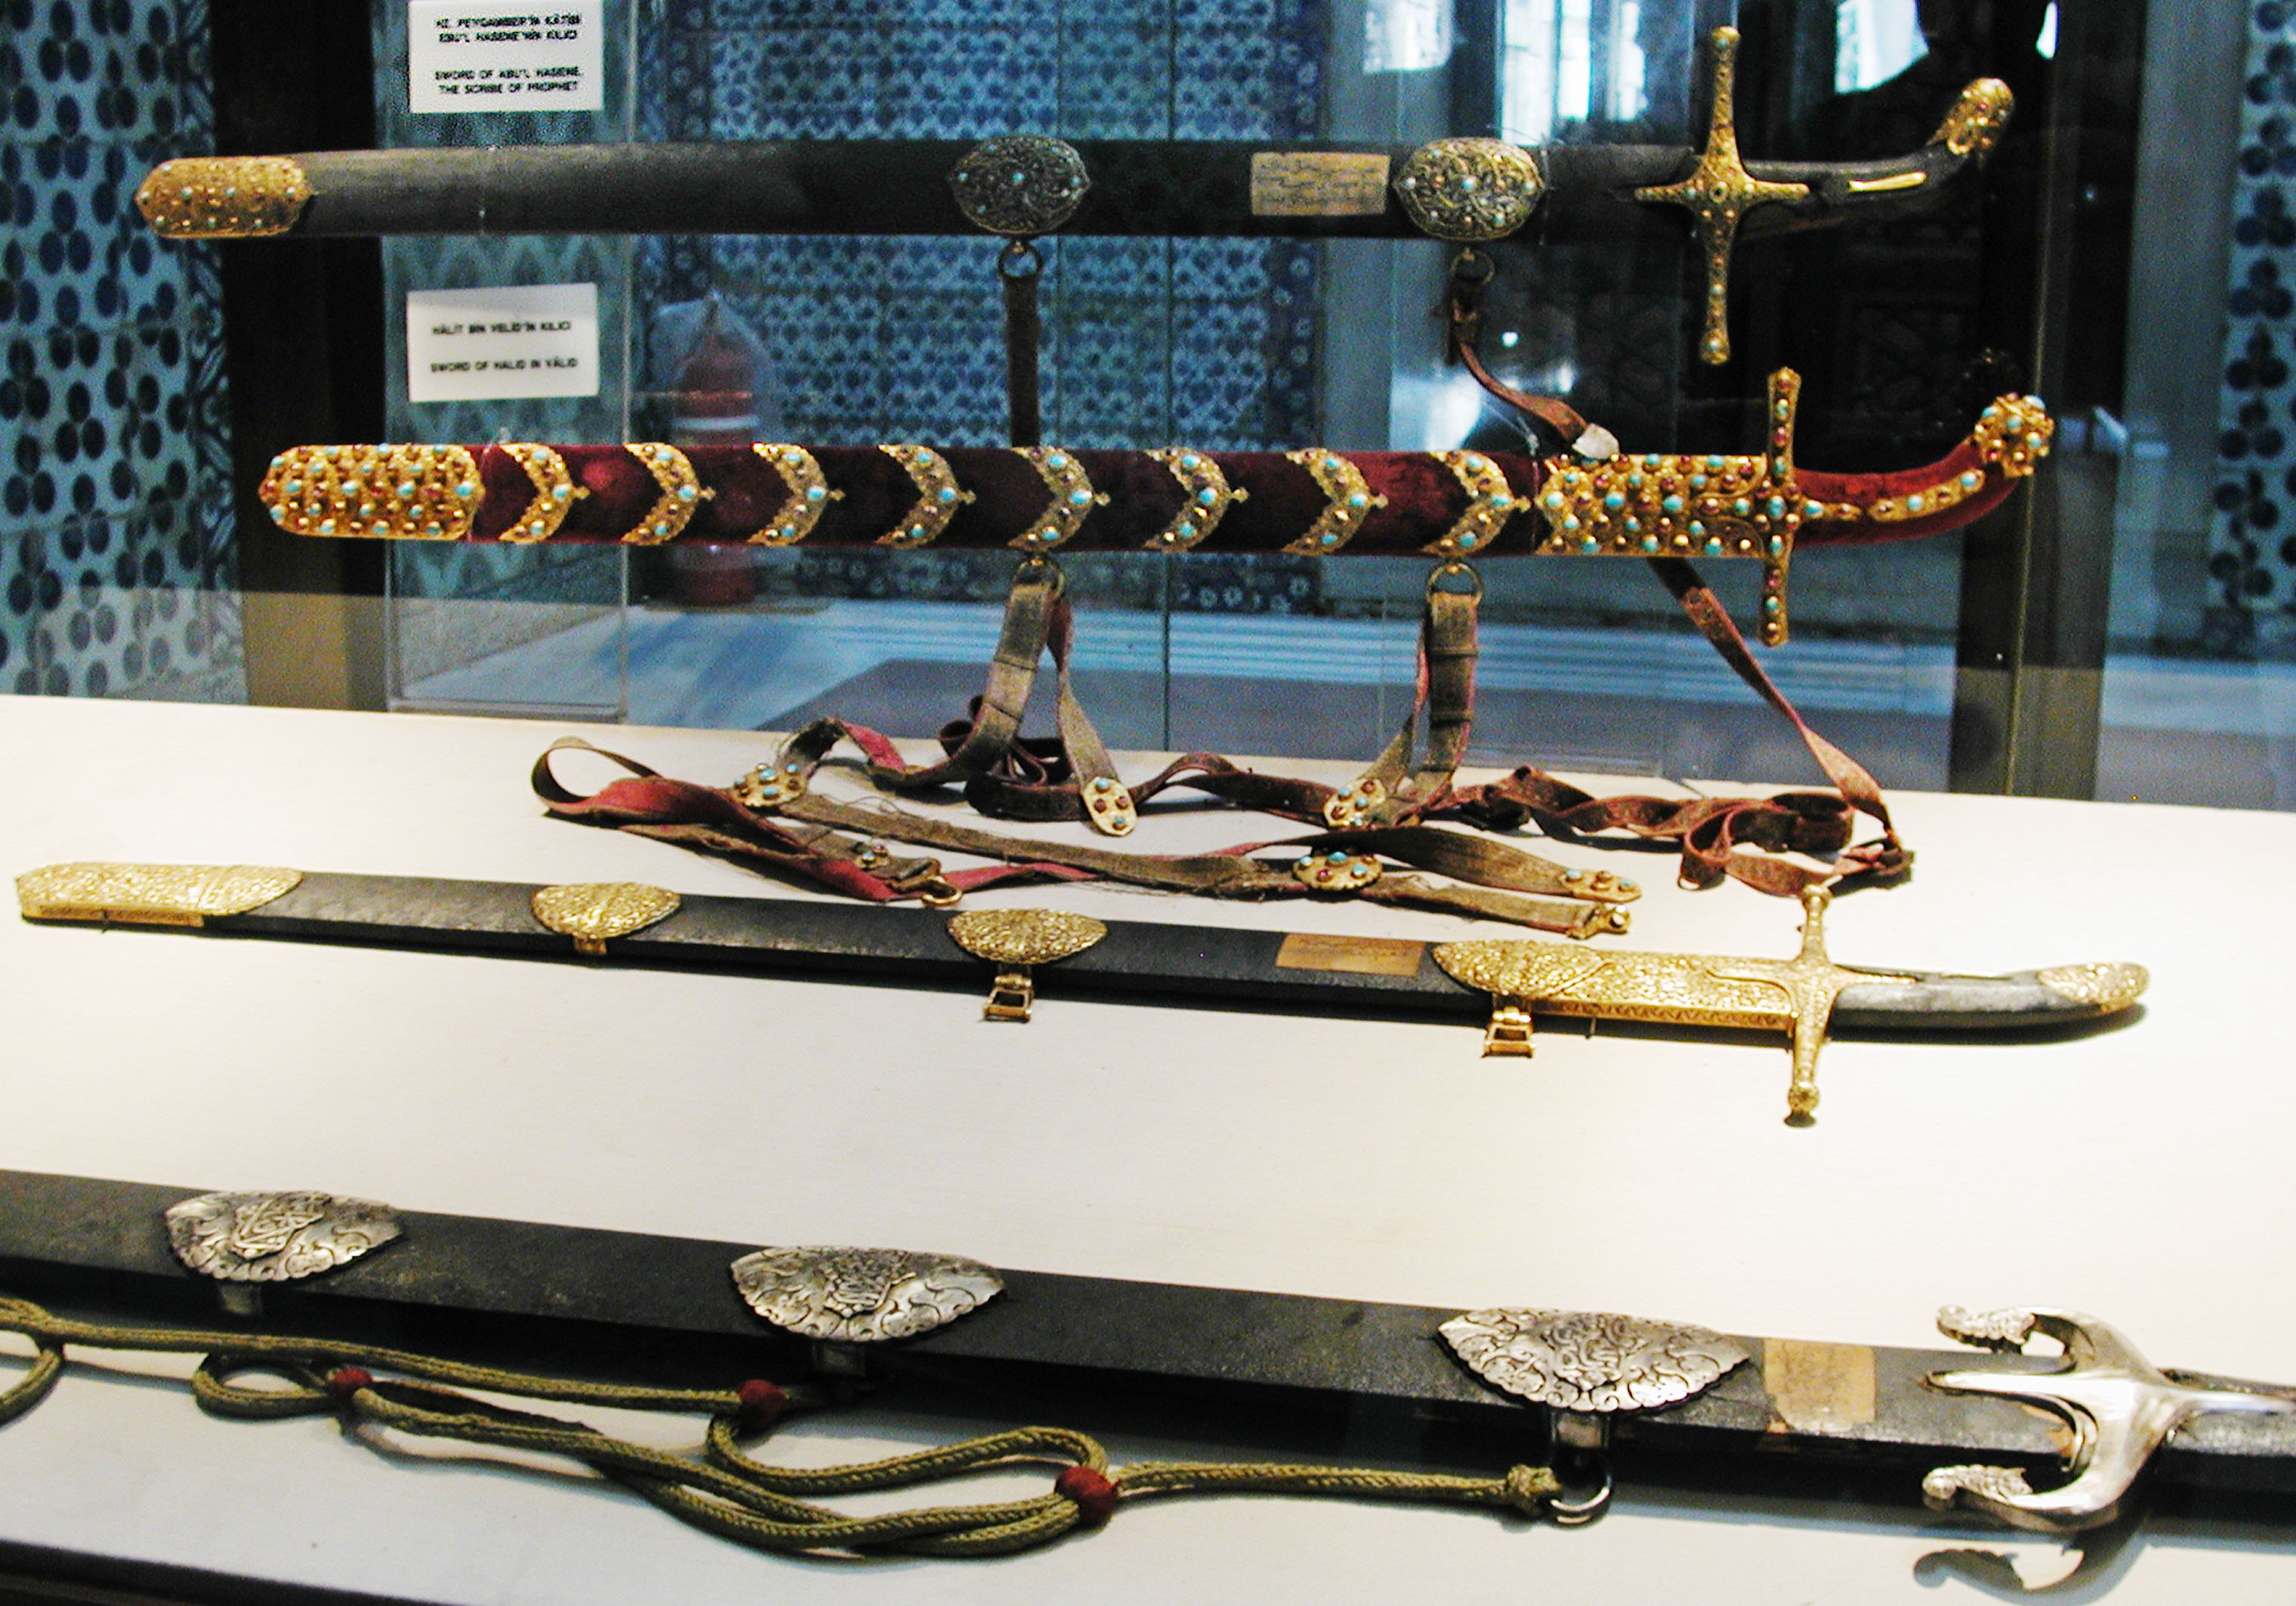 Khalid Bin Al-waleed Swords Palace and museum of Topkapi Istanbul